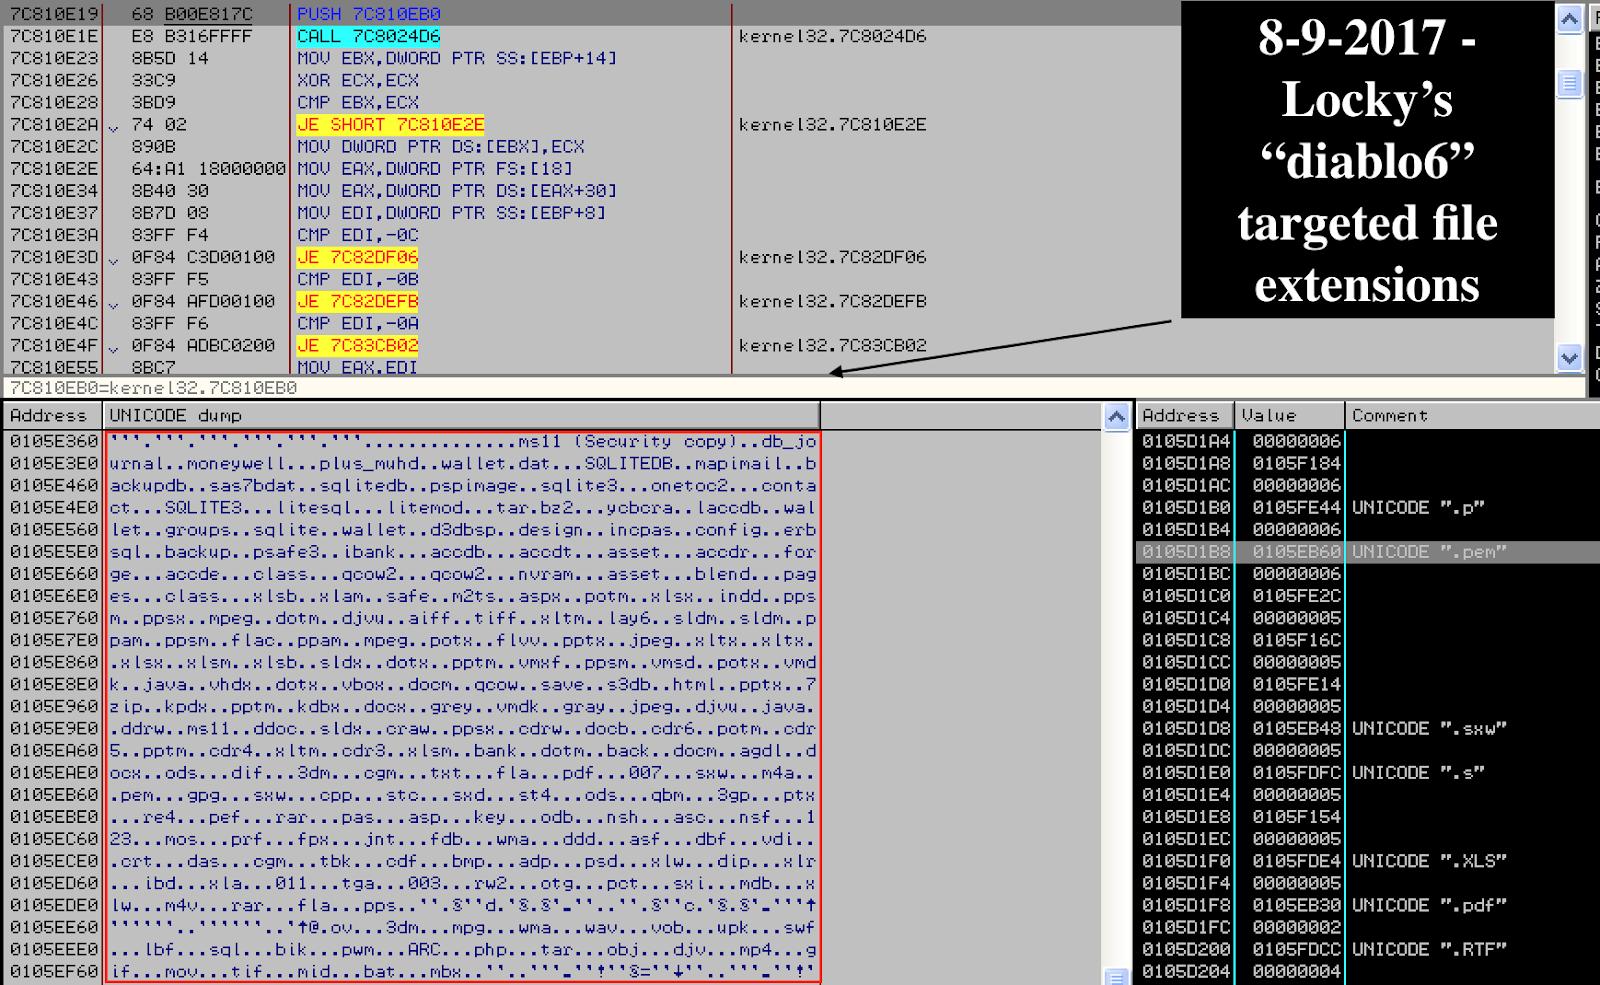 Kaspersky Internet Security 2006 (Prototype) build 6 0 9 96 .rar